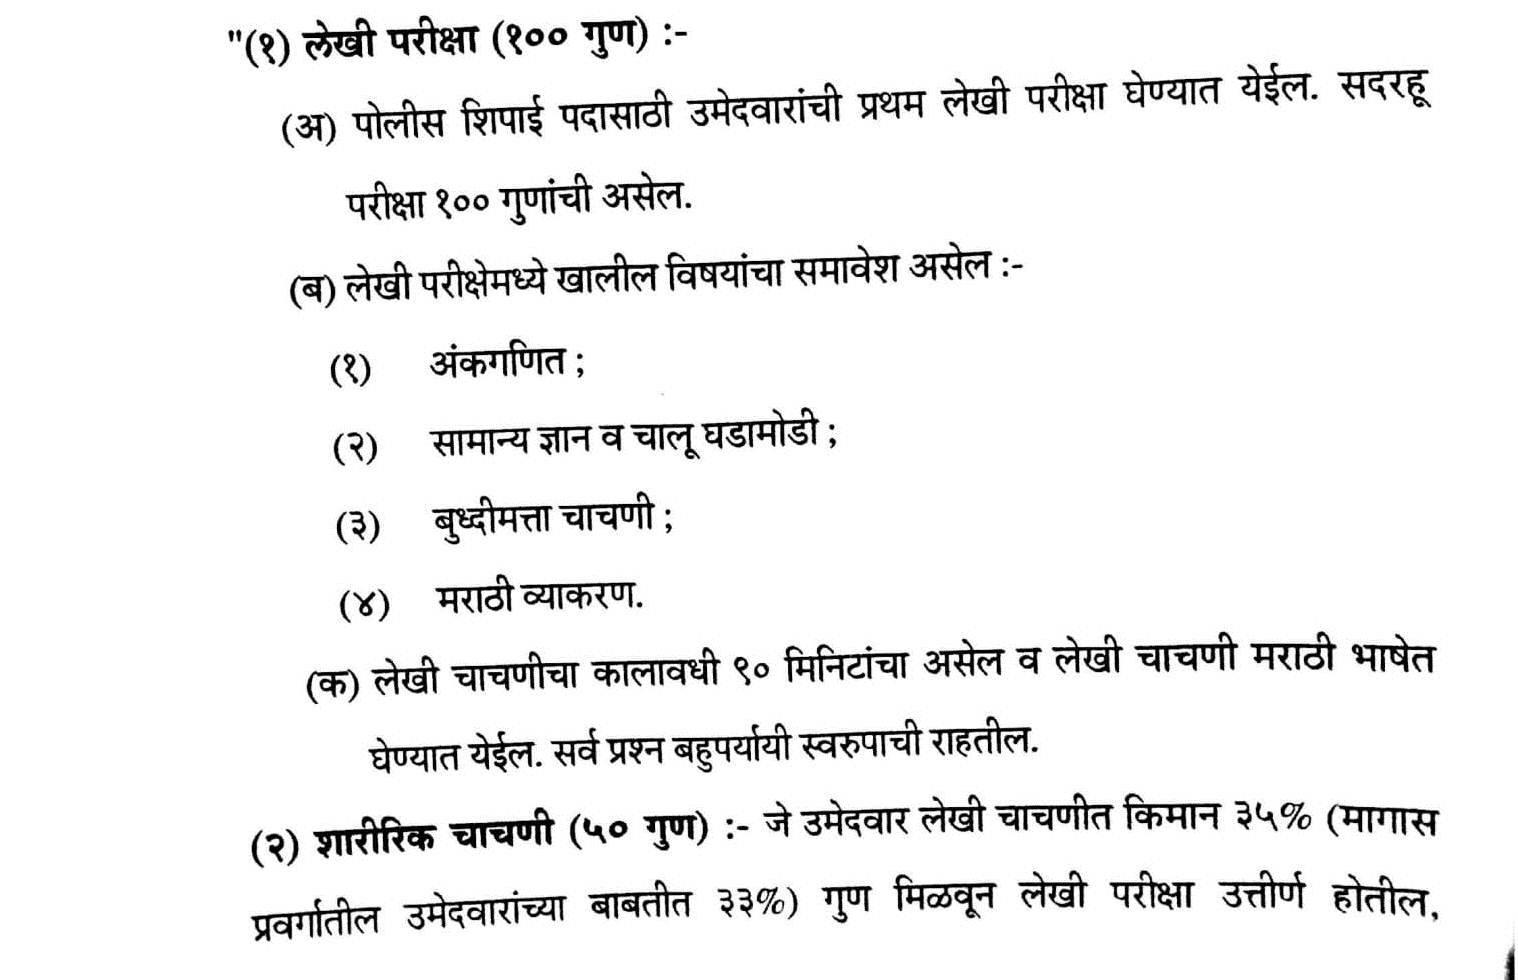 Maharashtra Police Constable Syllabus 2019